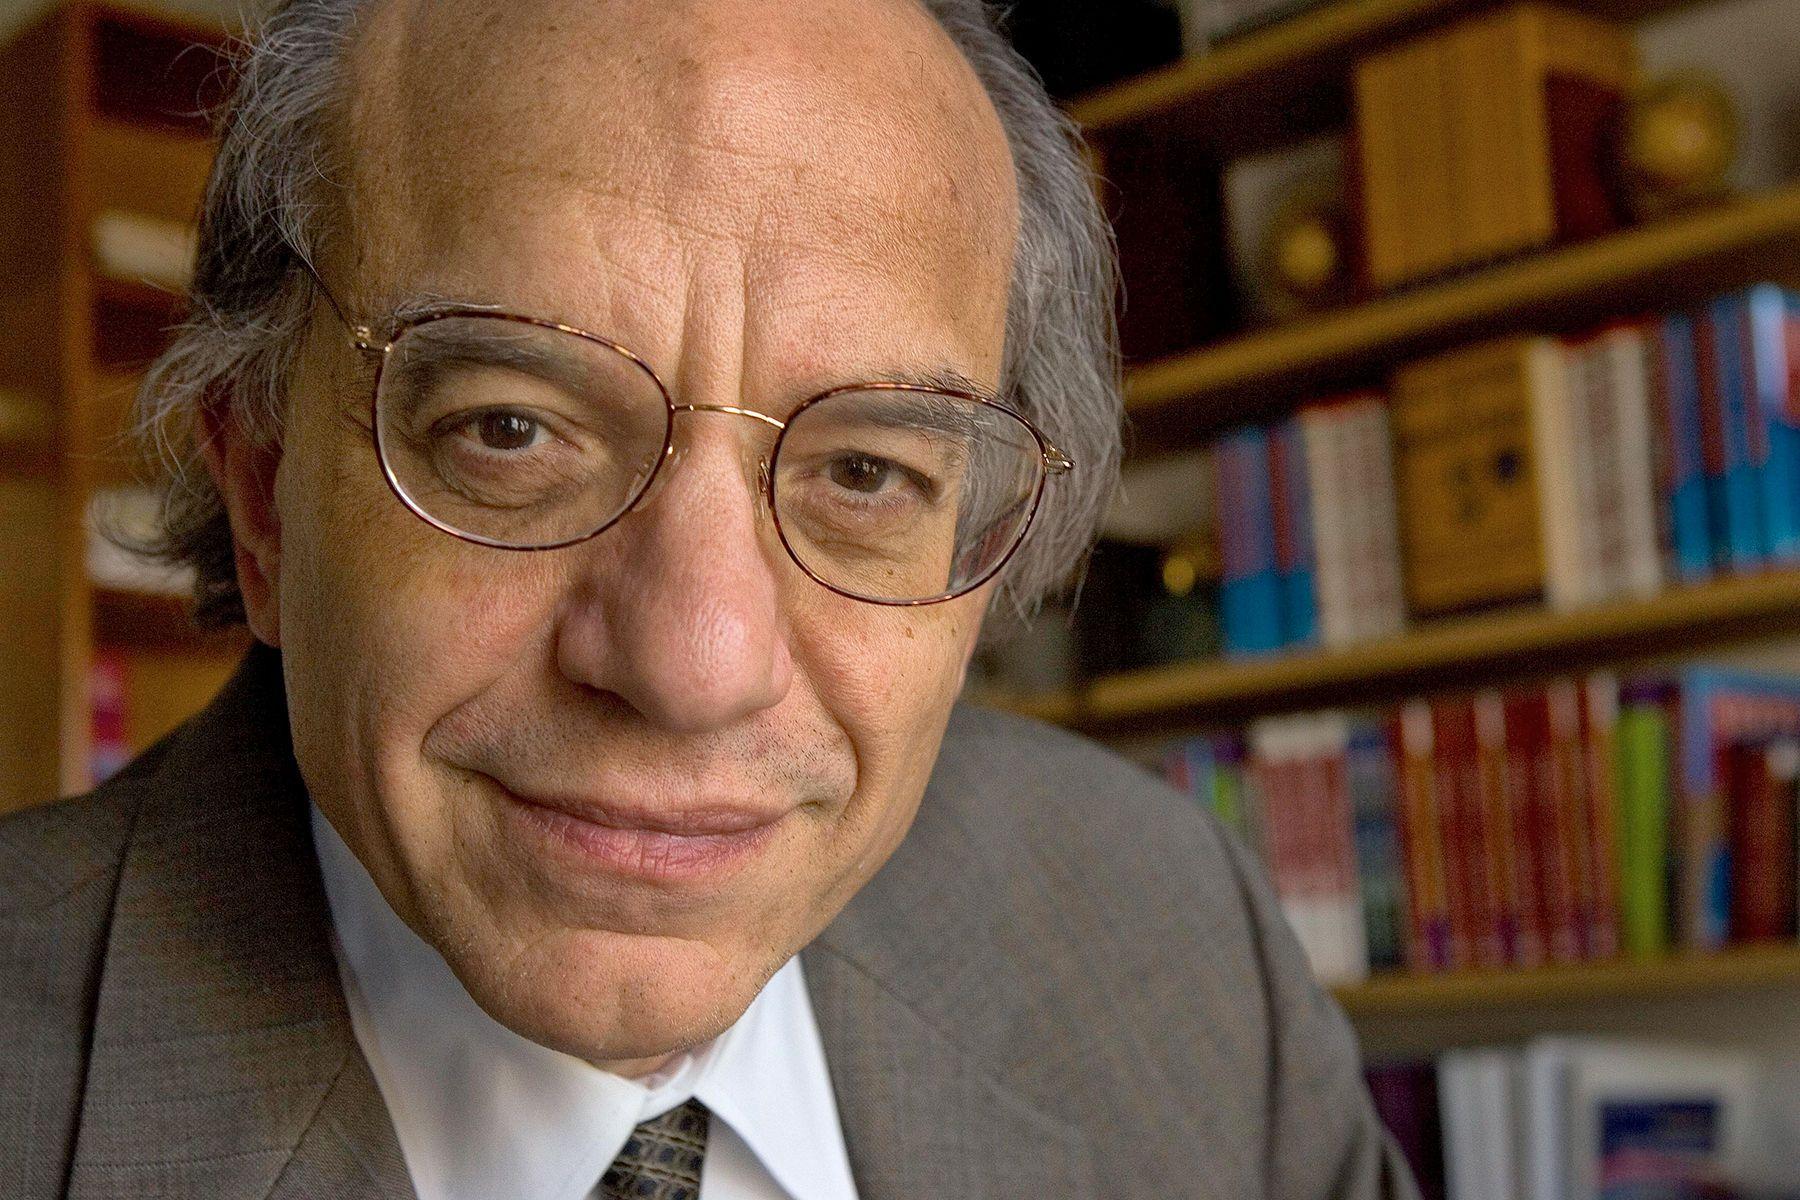 Dr. Jeremy J. Siegel